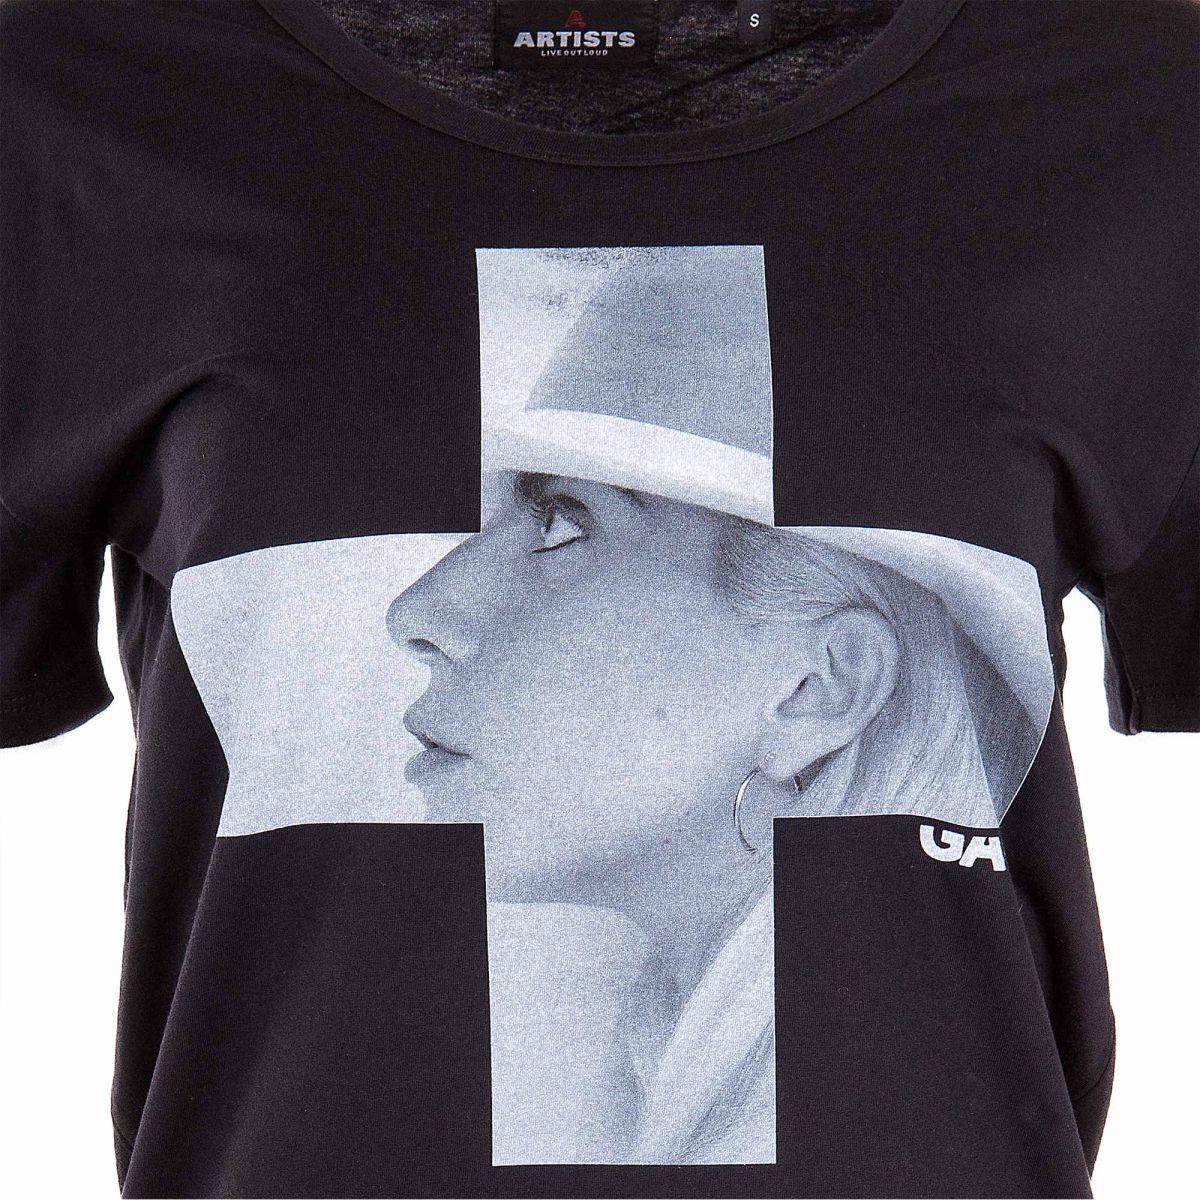 Tee Gaga Shirt Artists À Femme Lady Prix Dégriffé Floqué OXuPTkZi